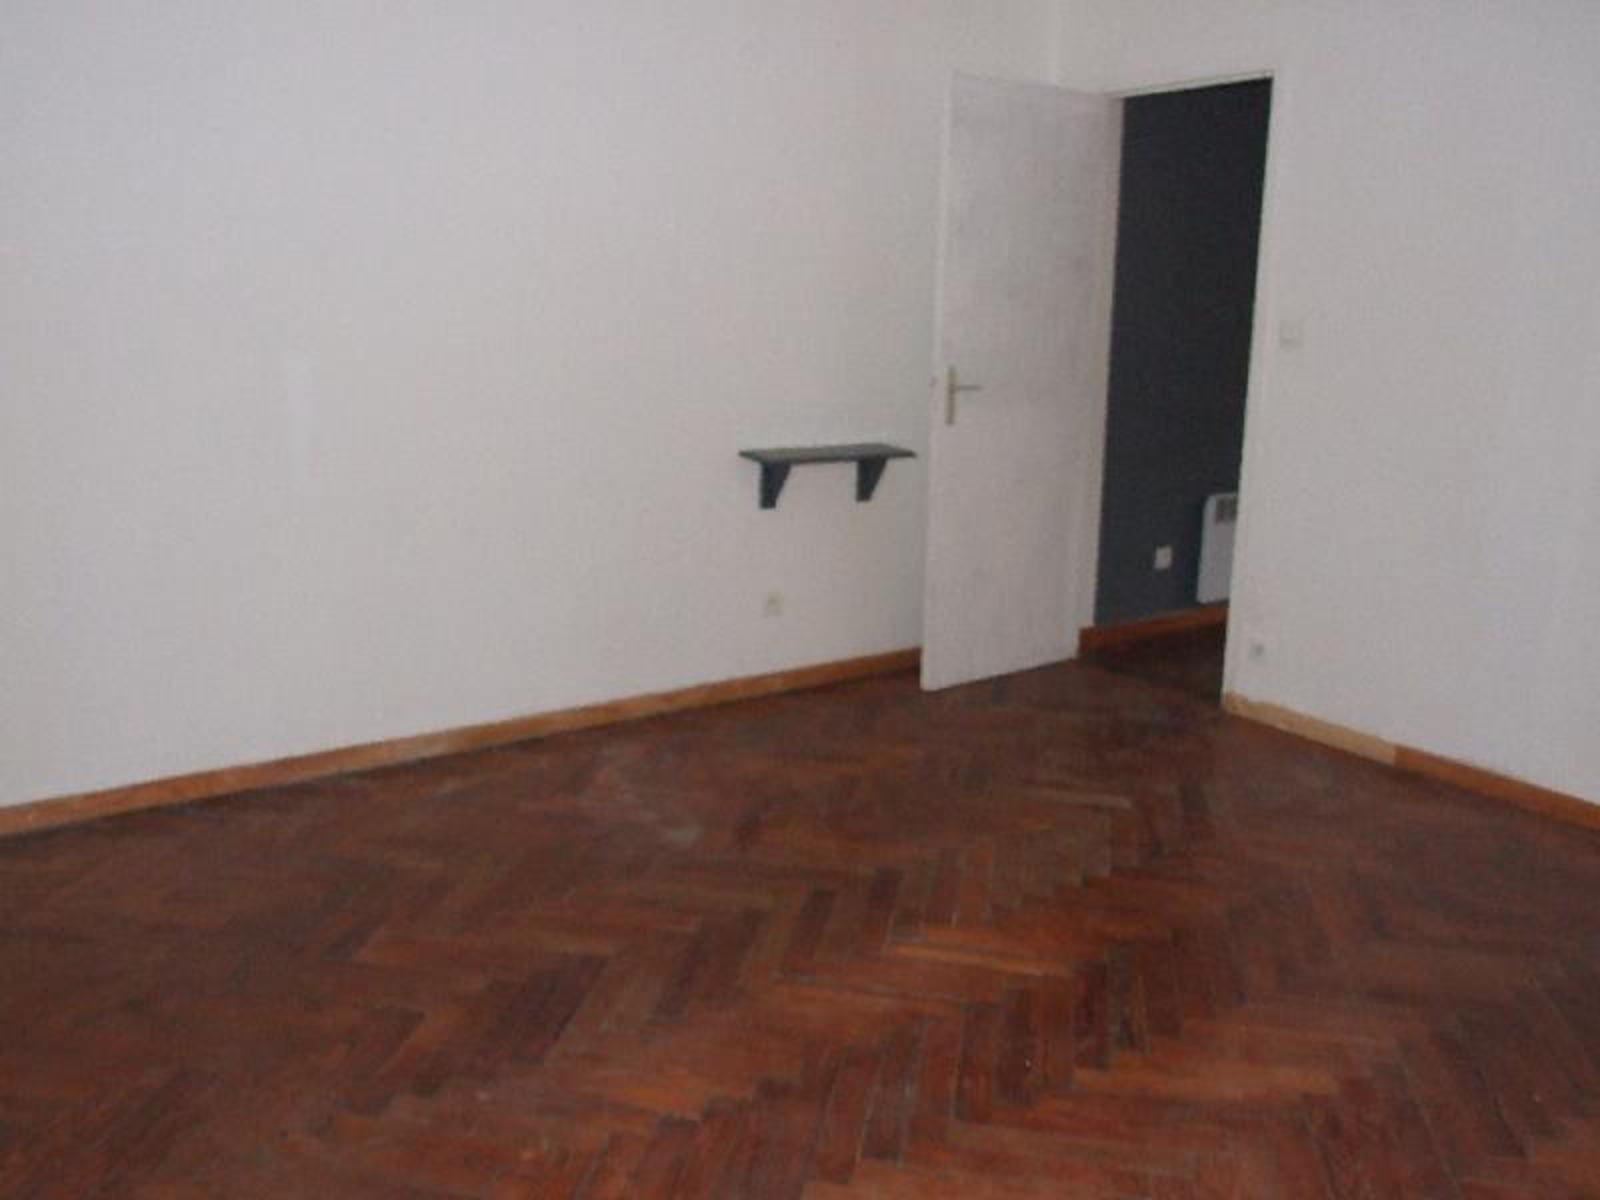 Saint omer appartement 1 chambre rdc immobili re de france - Chambre de commerce saint omer ...